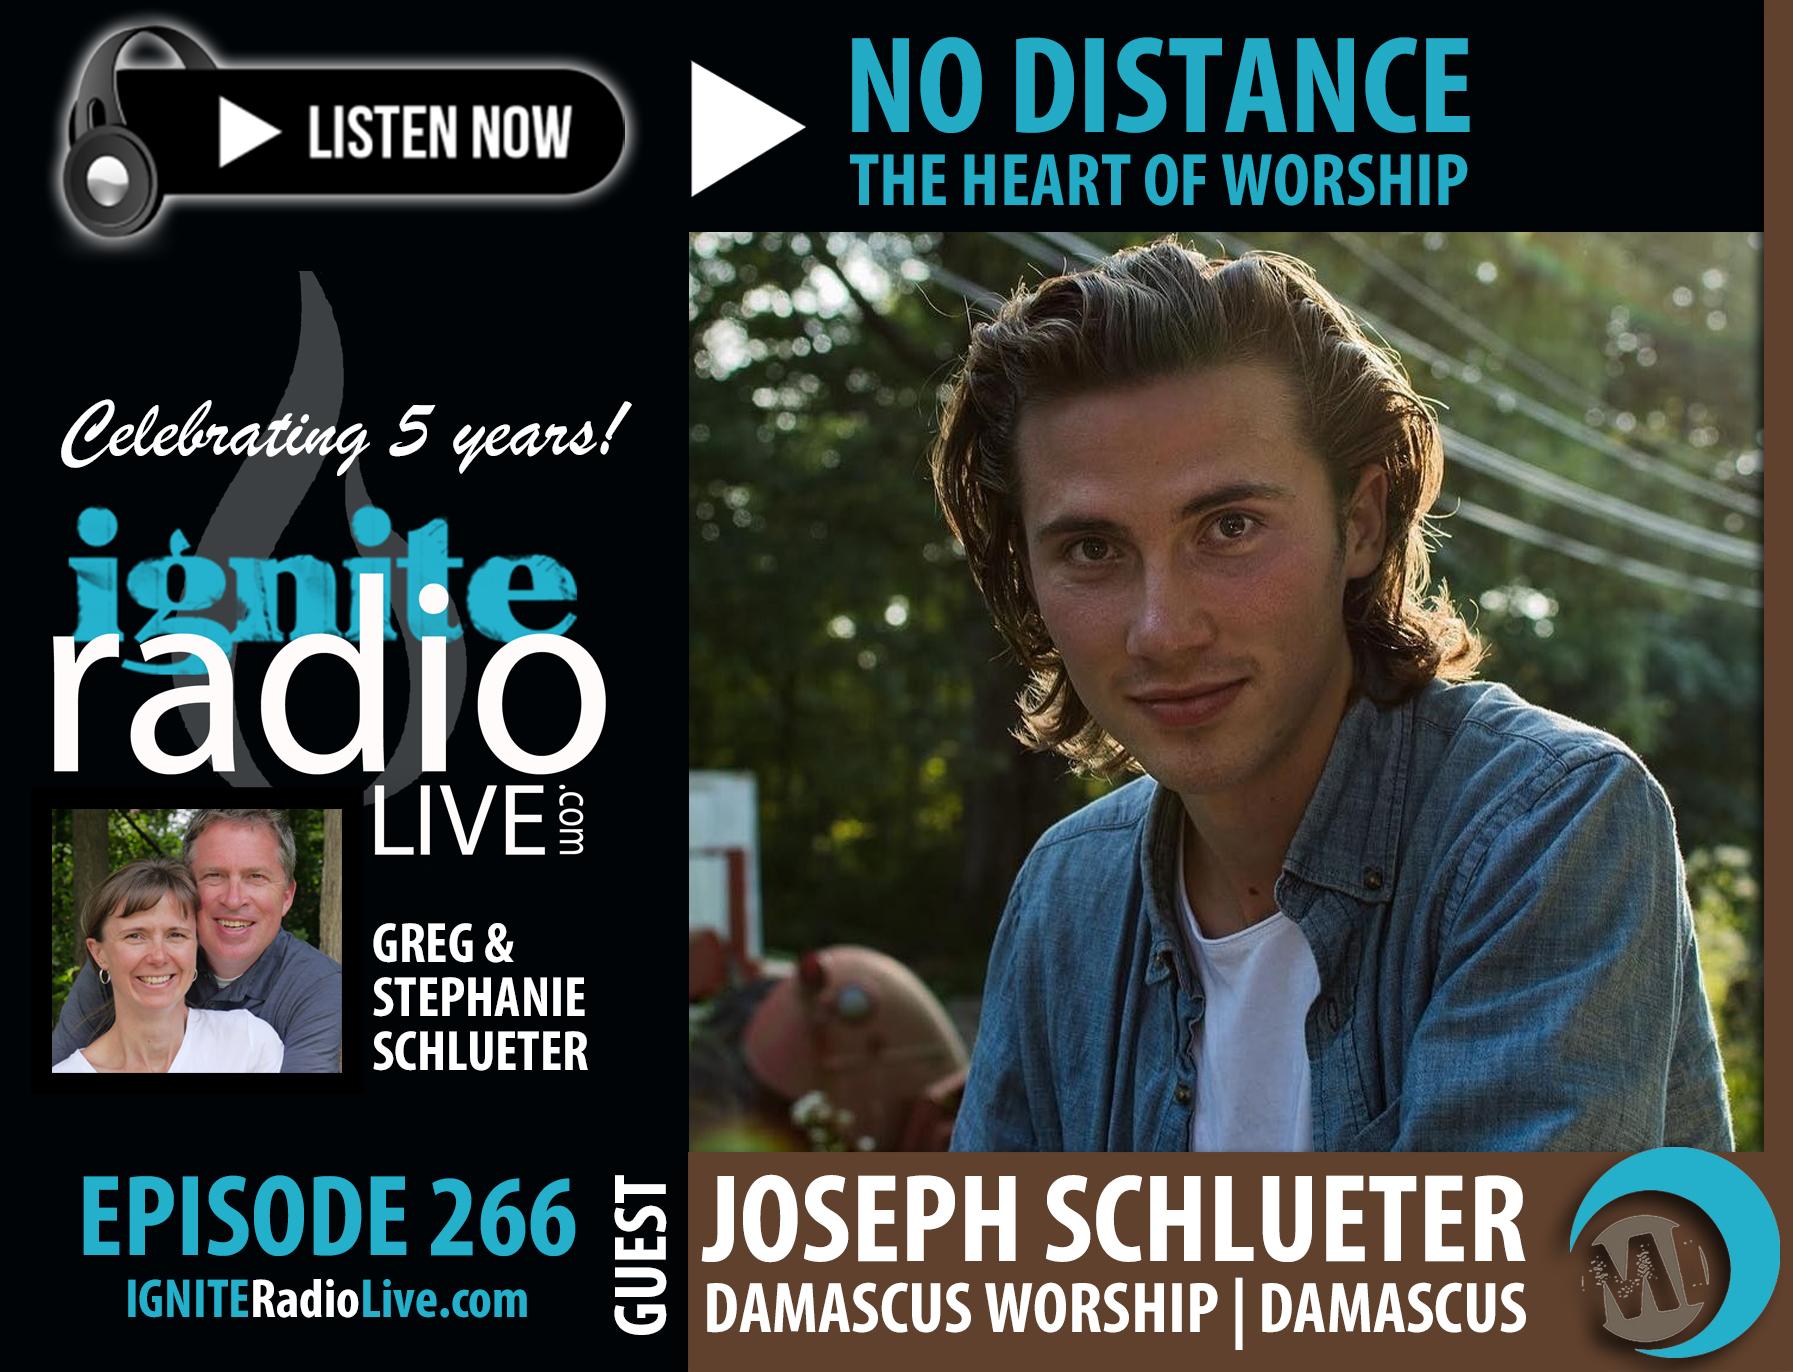 IGNITE RADIO LIIVE | Joseph Schlueter